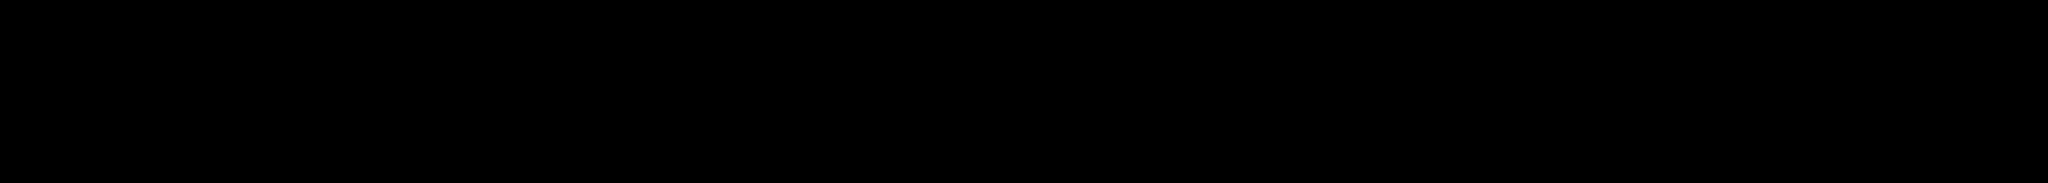 MihoBalletArtsタイトル文字